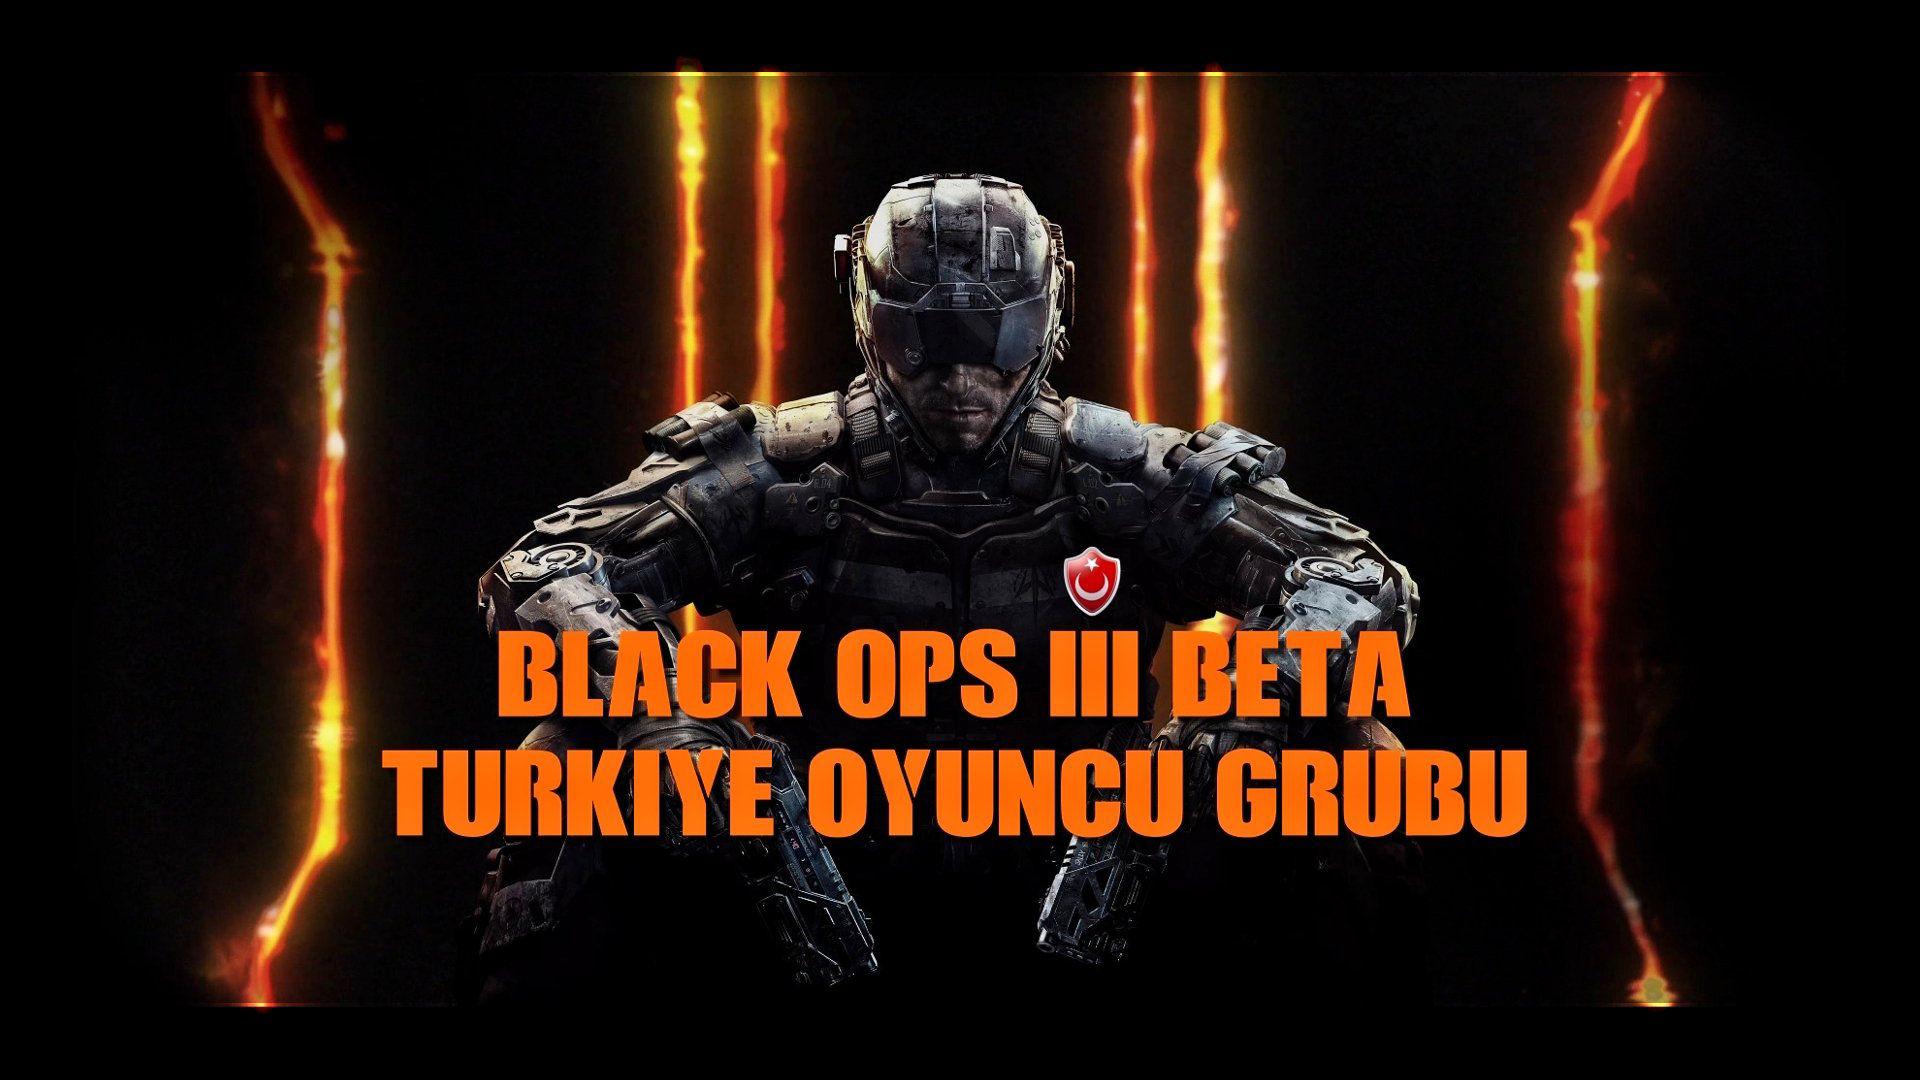 Black Ops 3 Beta Türkiye Oyuncu Grubu